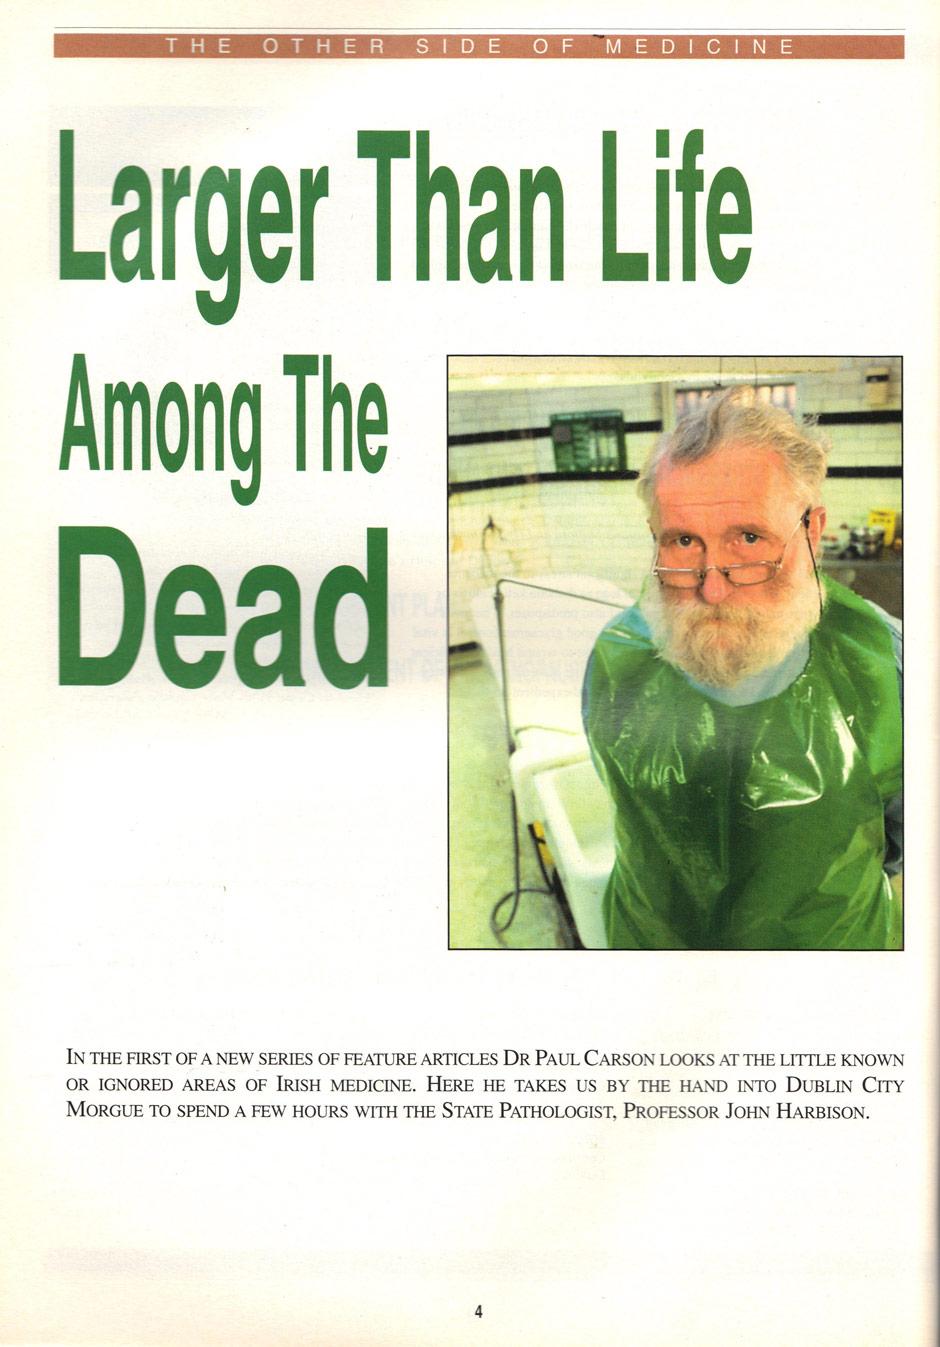 Dublin City Morgue